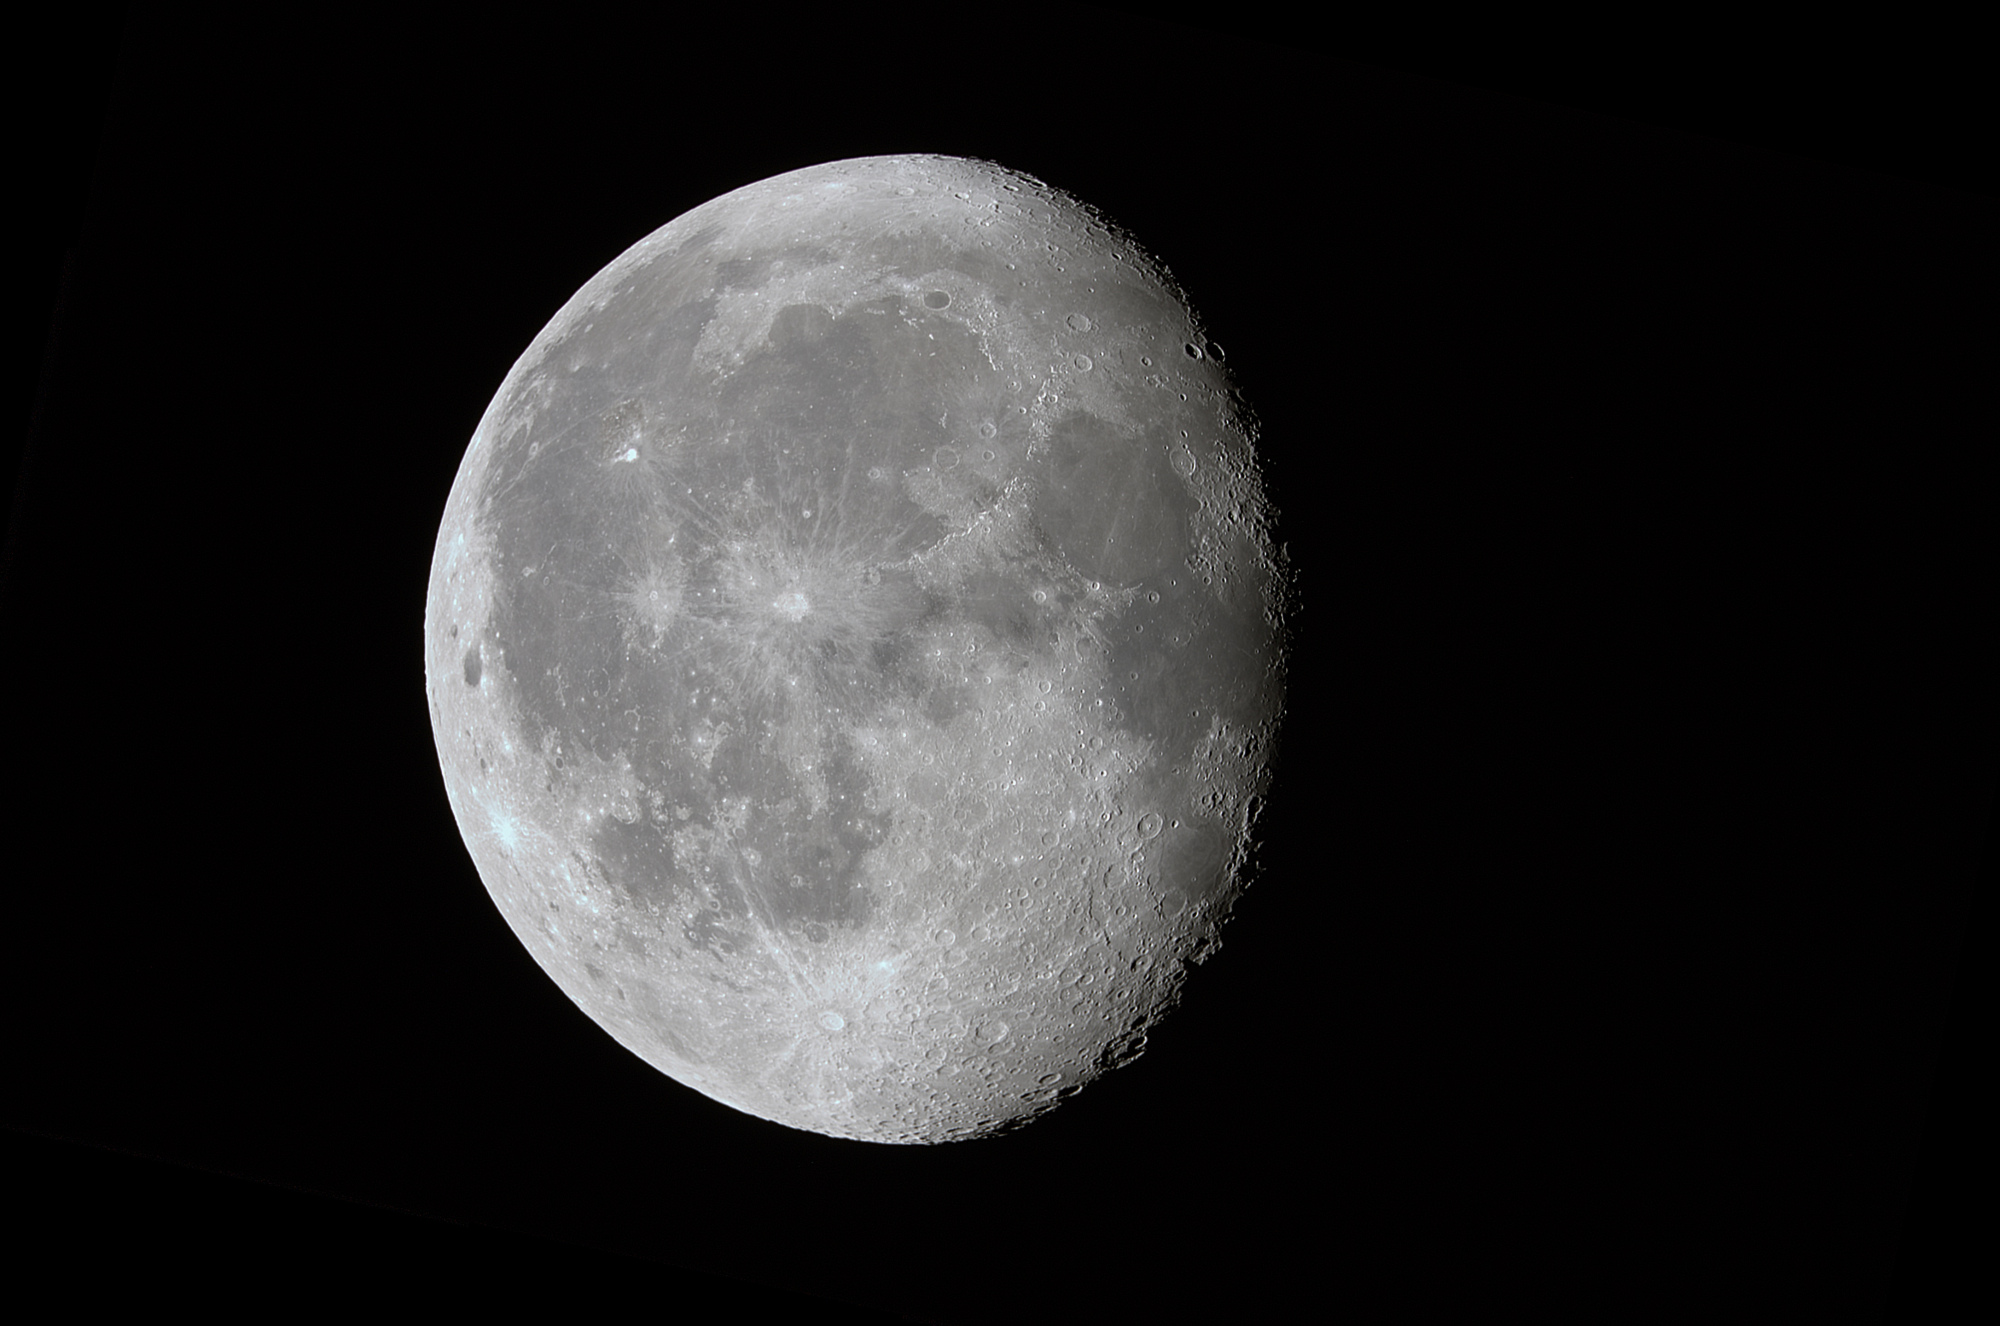 5d835b72586d8_Moon1809.thumb.jpg.fec3e9ca58f543ecb529e812cdf924a6.jpg